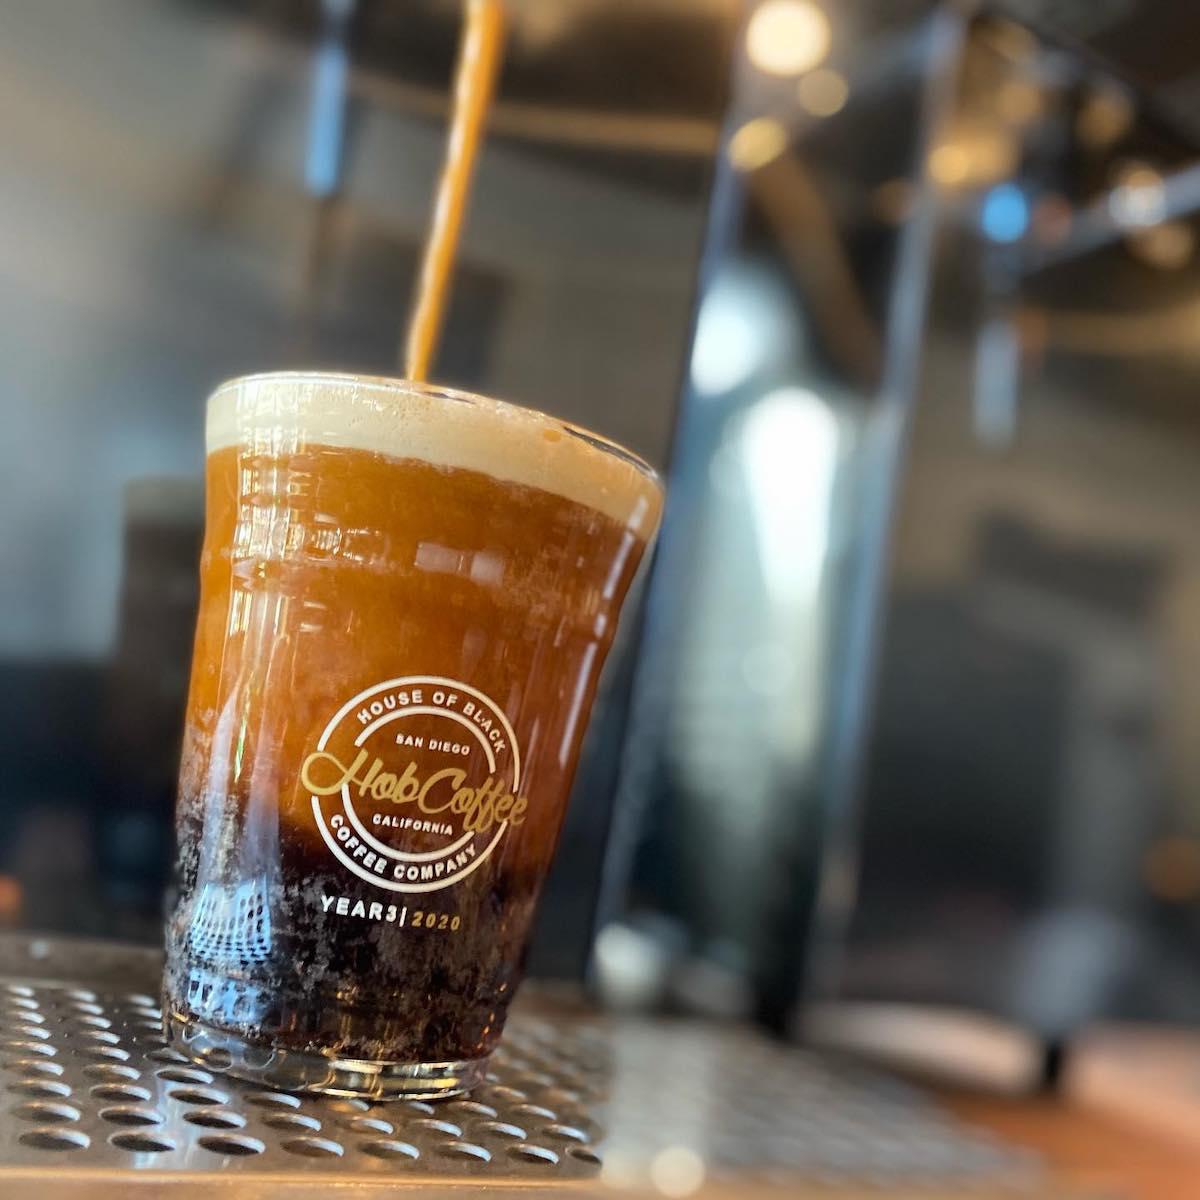 House of Black Coffee Company Plans Expansion Near Balboa Park